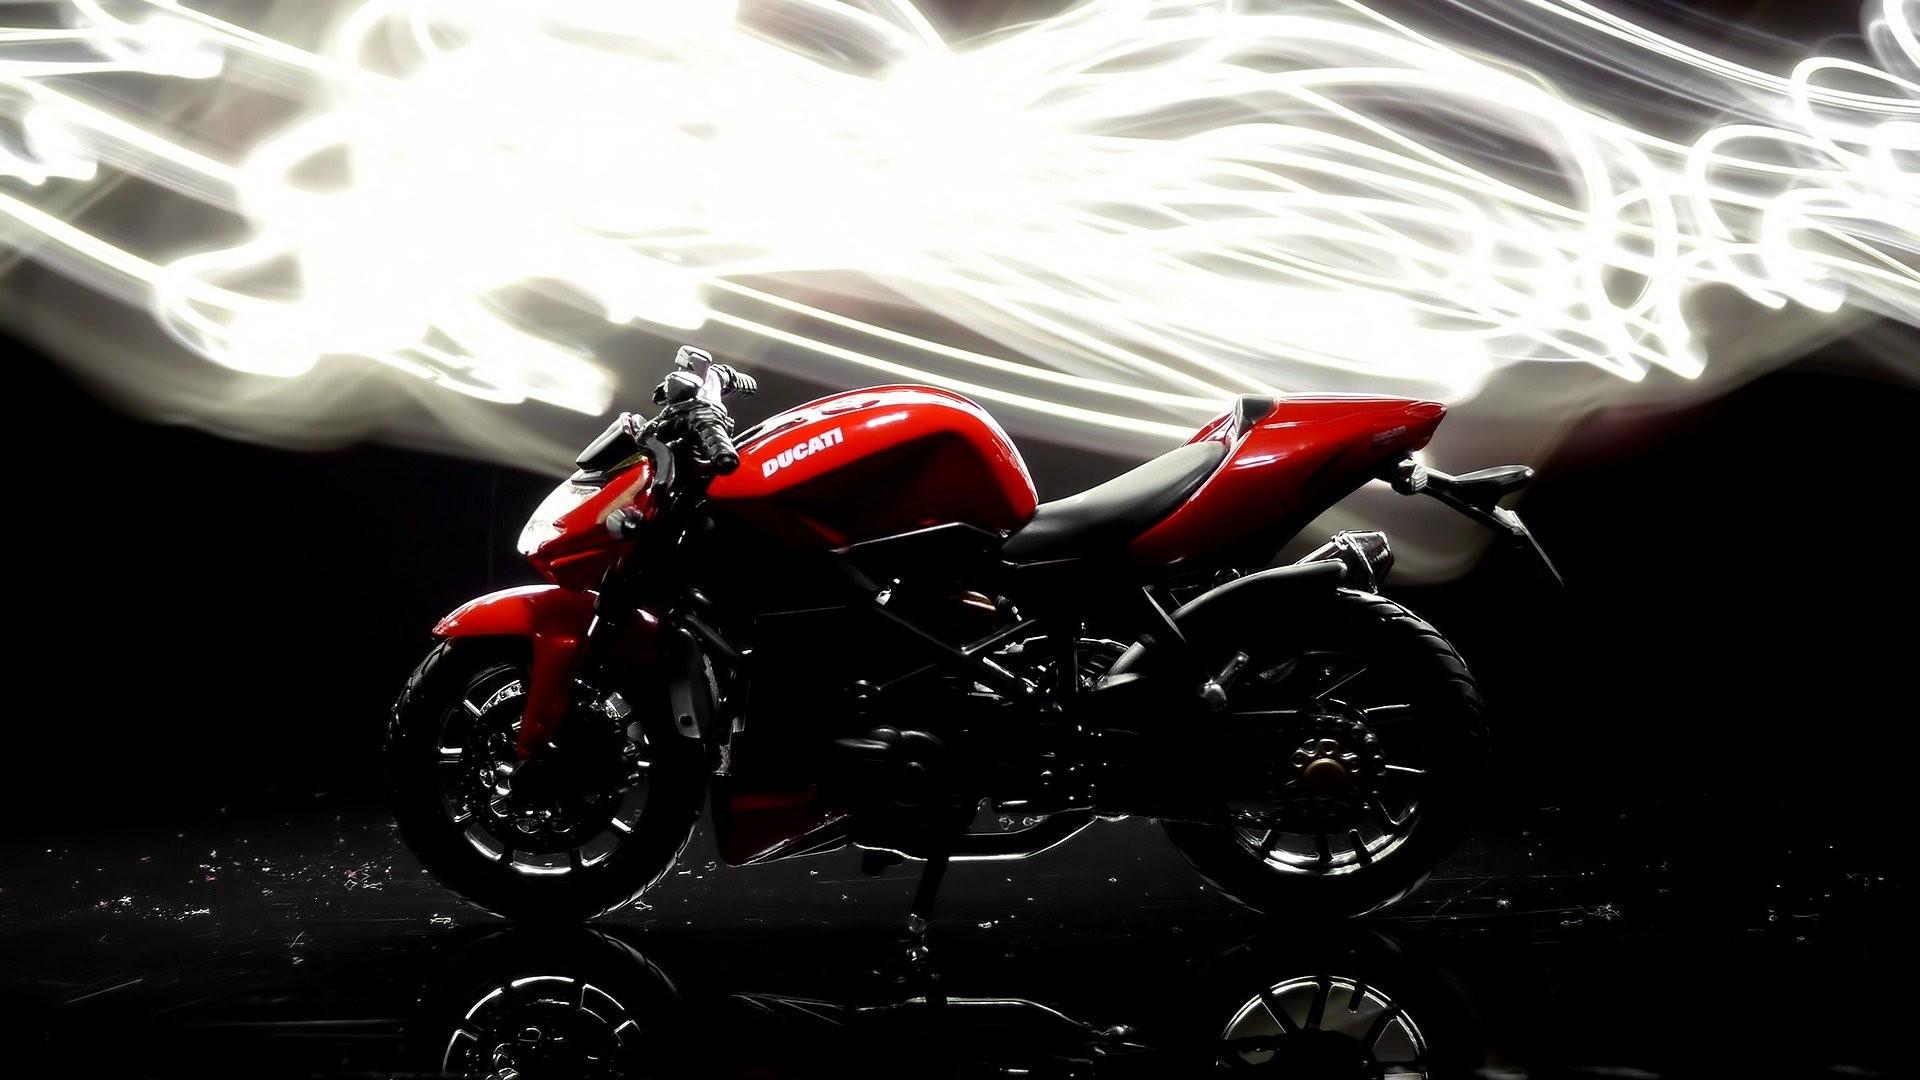 Ducati Motorcycles Wallpaper 1920x1080 Ducati Motorcycles 1920x1080